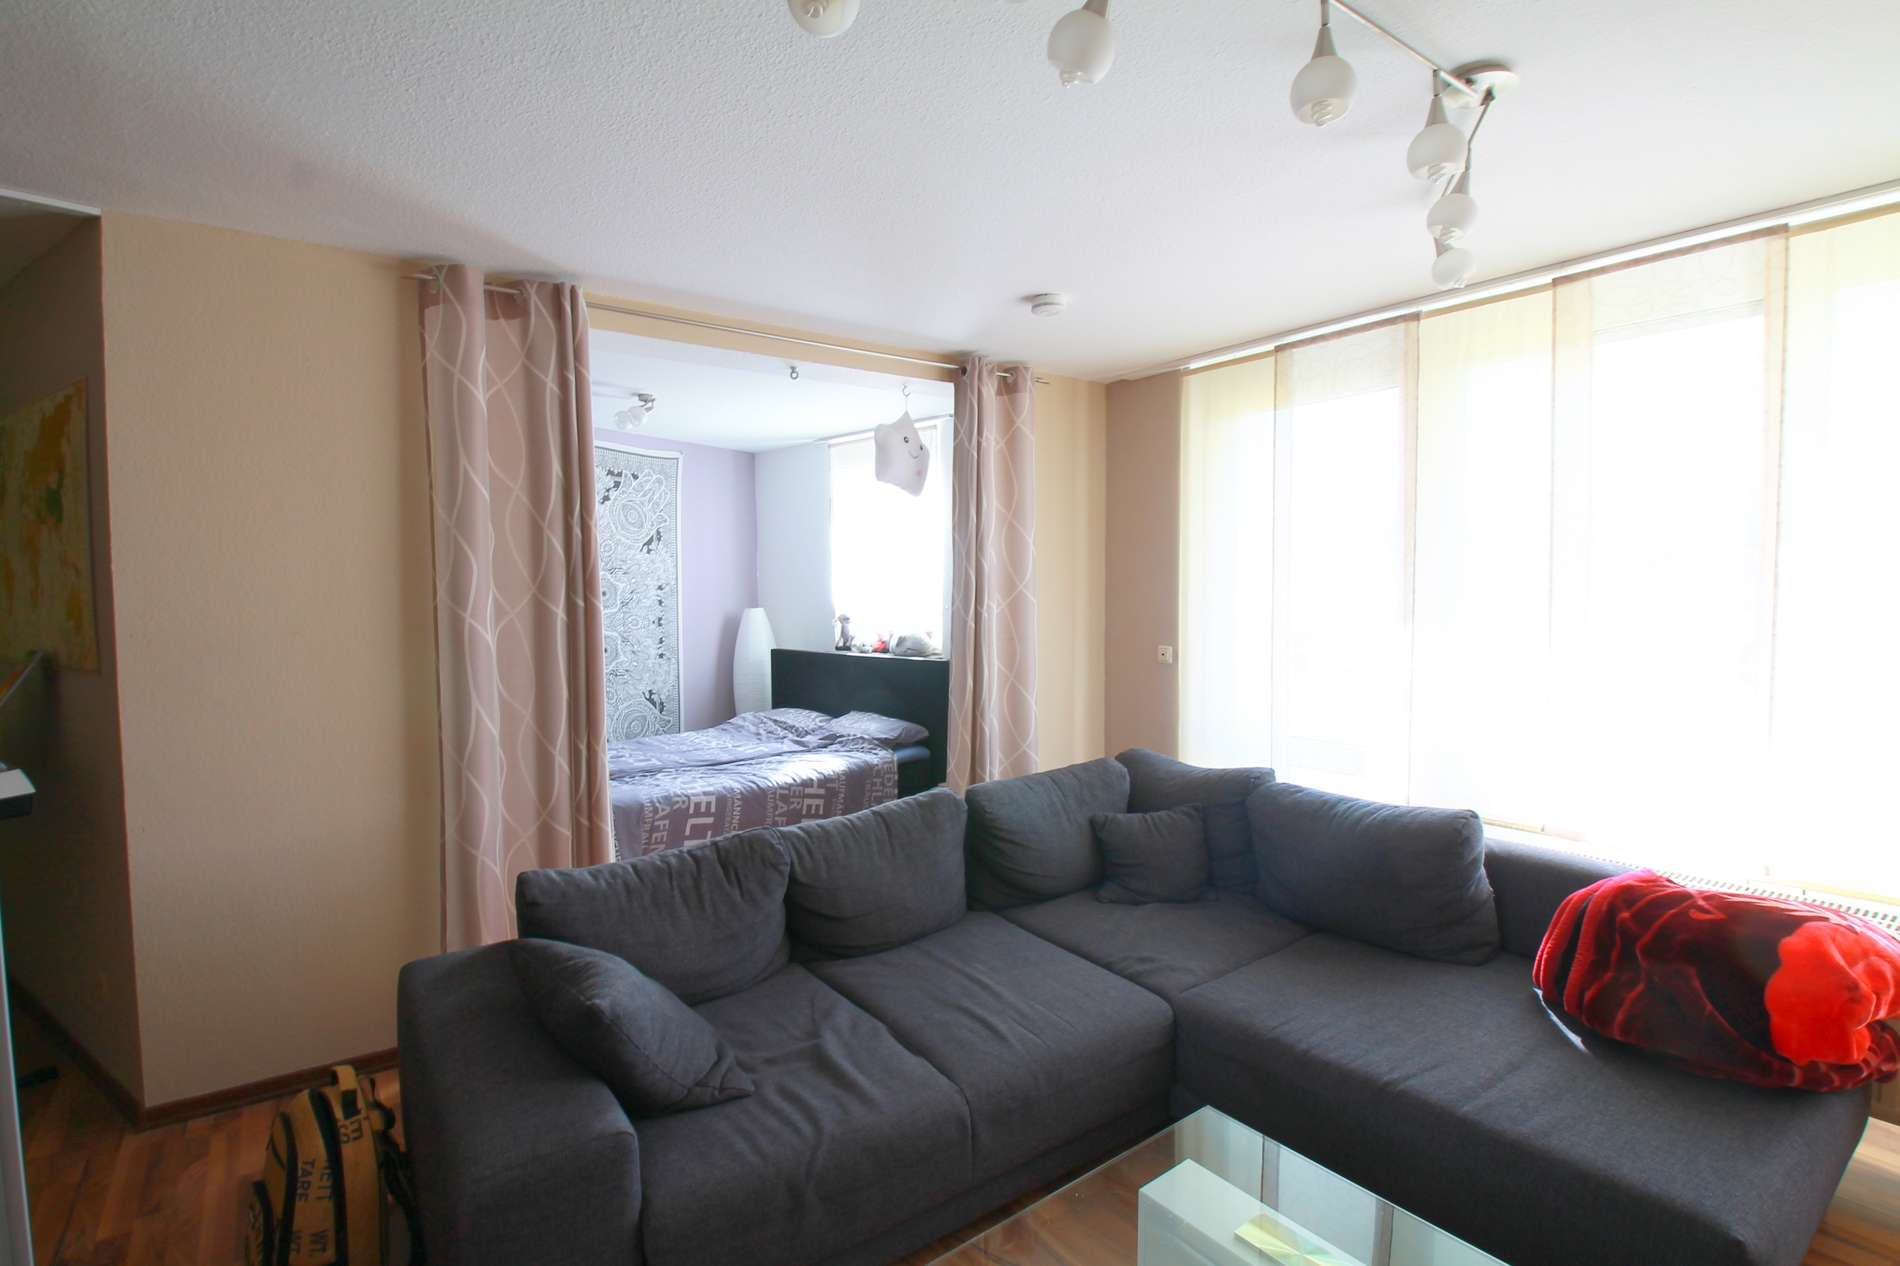 Geräumige Wohnung in perfekter Citylage! in